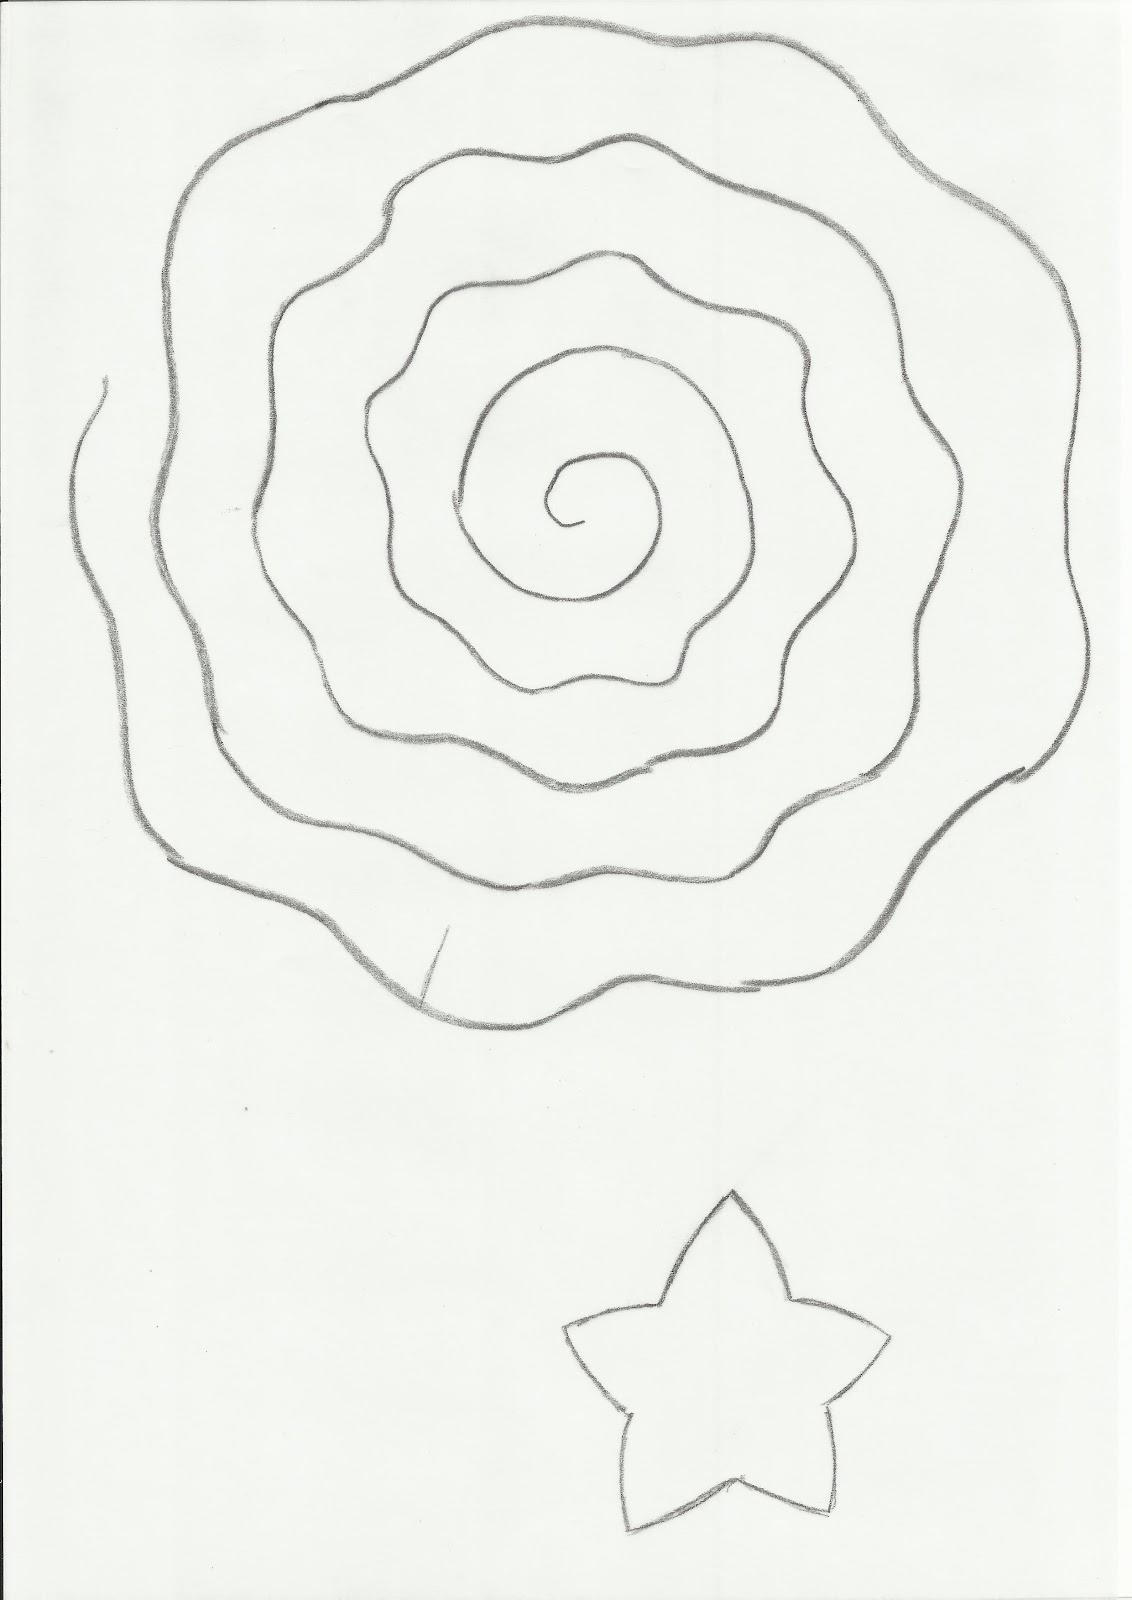 Rolled Paper Flower Template Blackdgfitness